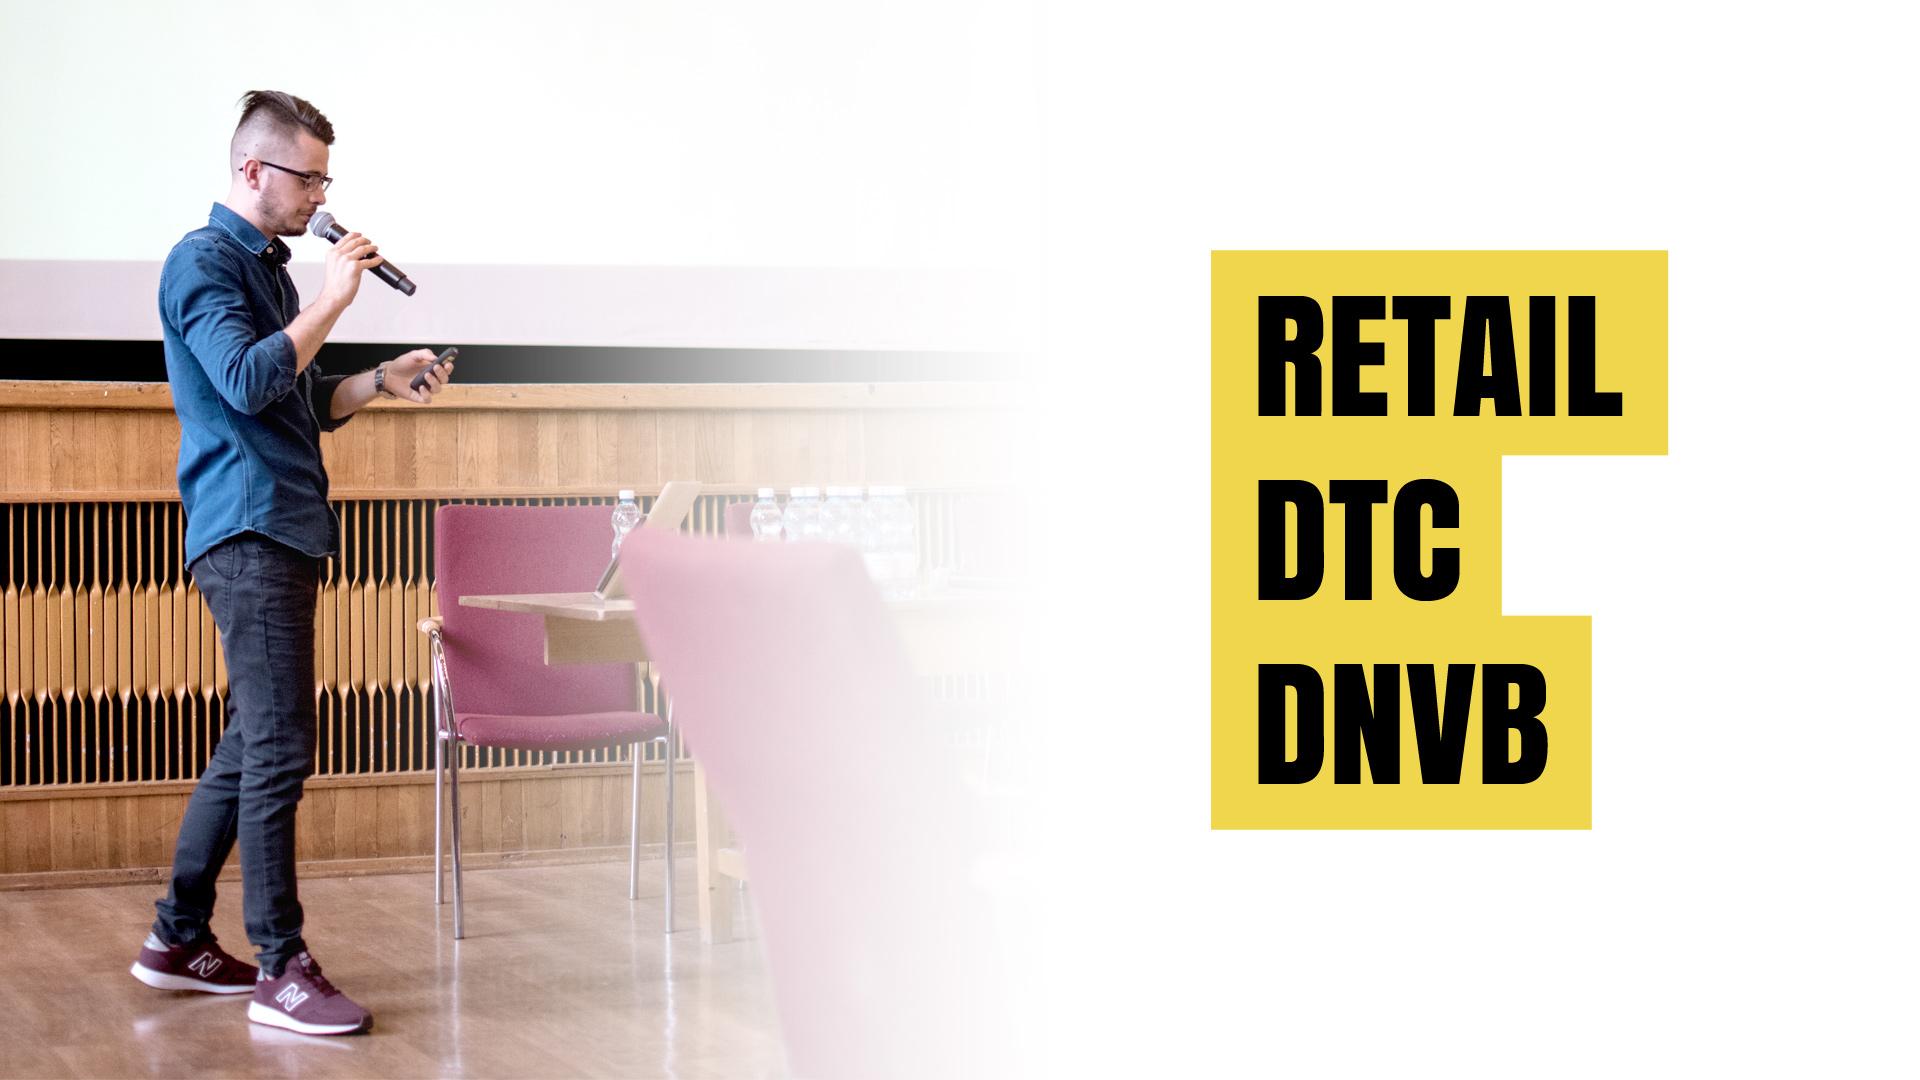 Czym różnią się retail e-commerce od DTC i DNVB e-commerce?